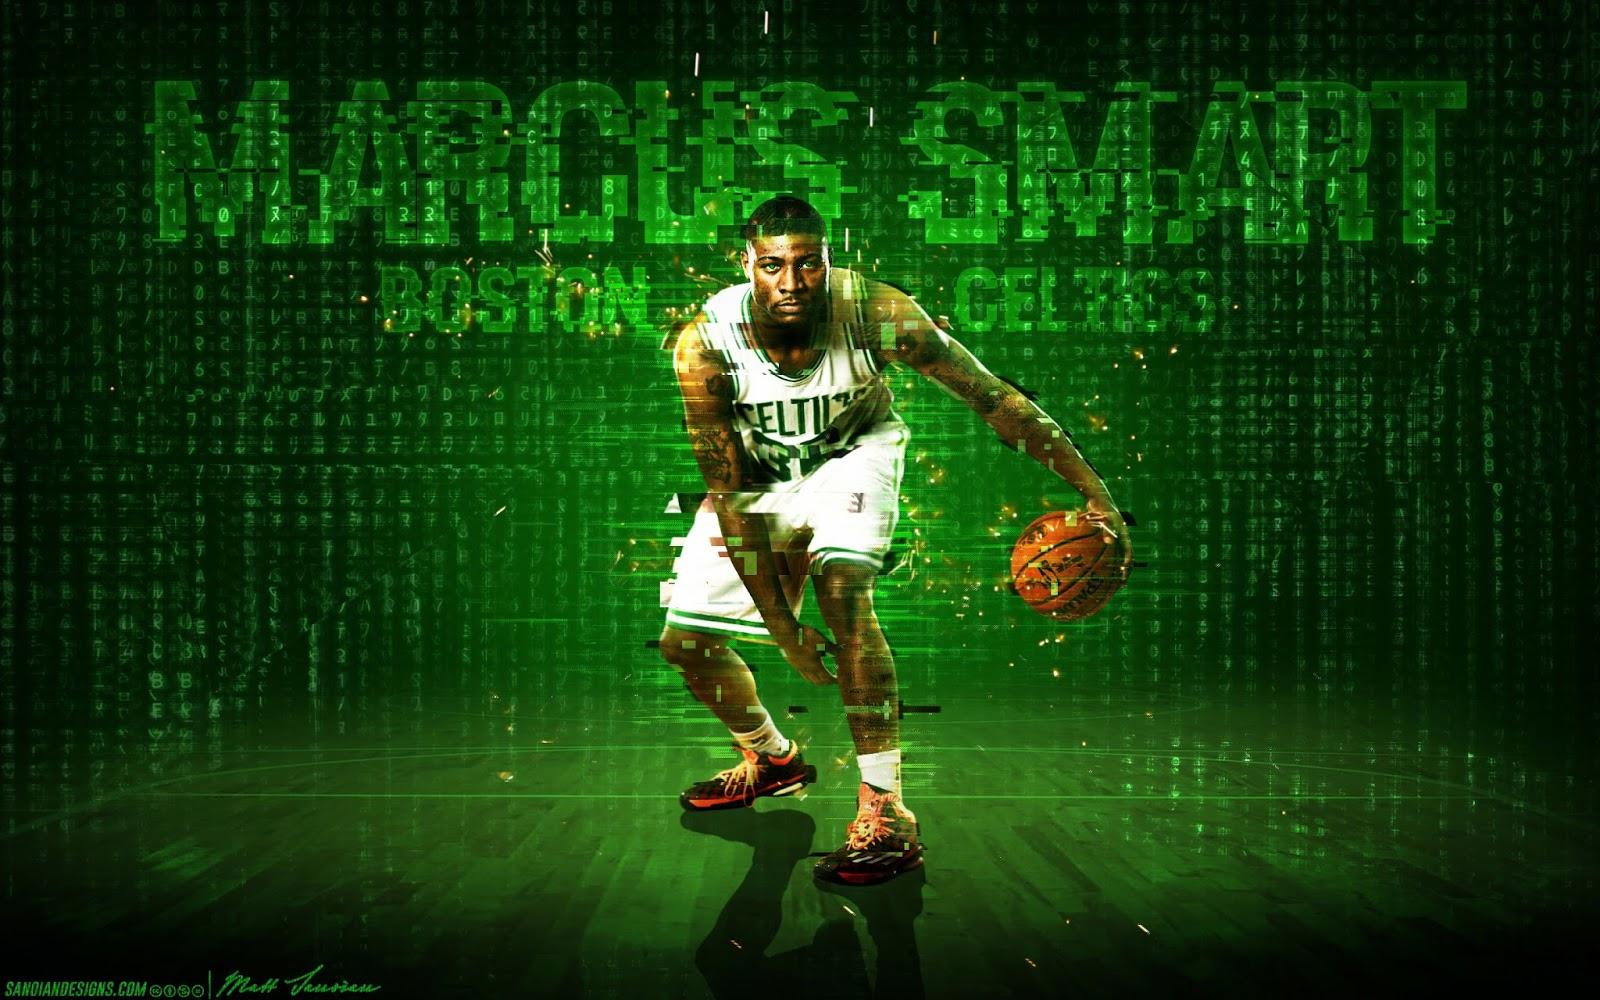 Wallpaper Wednesday Marcus Smart Celticslife Com Boston Celtics